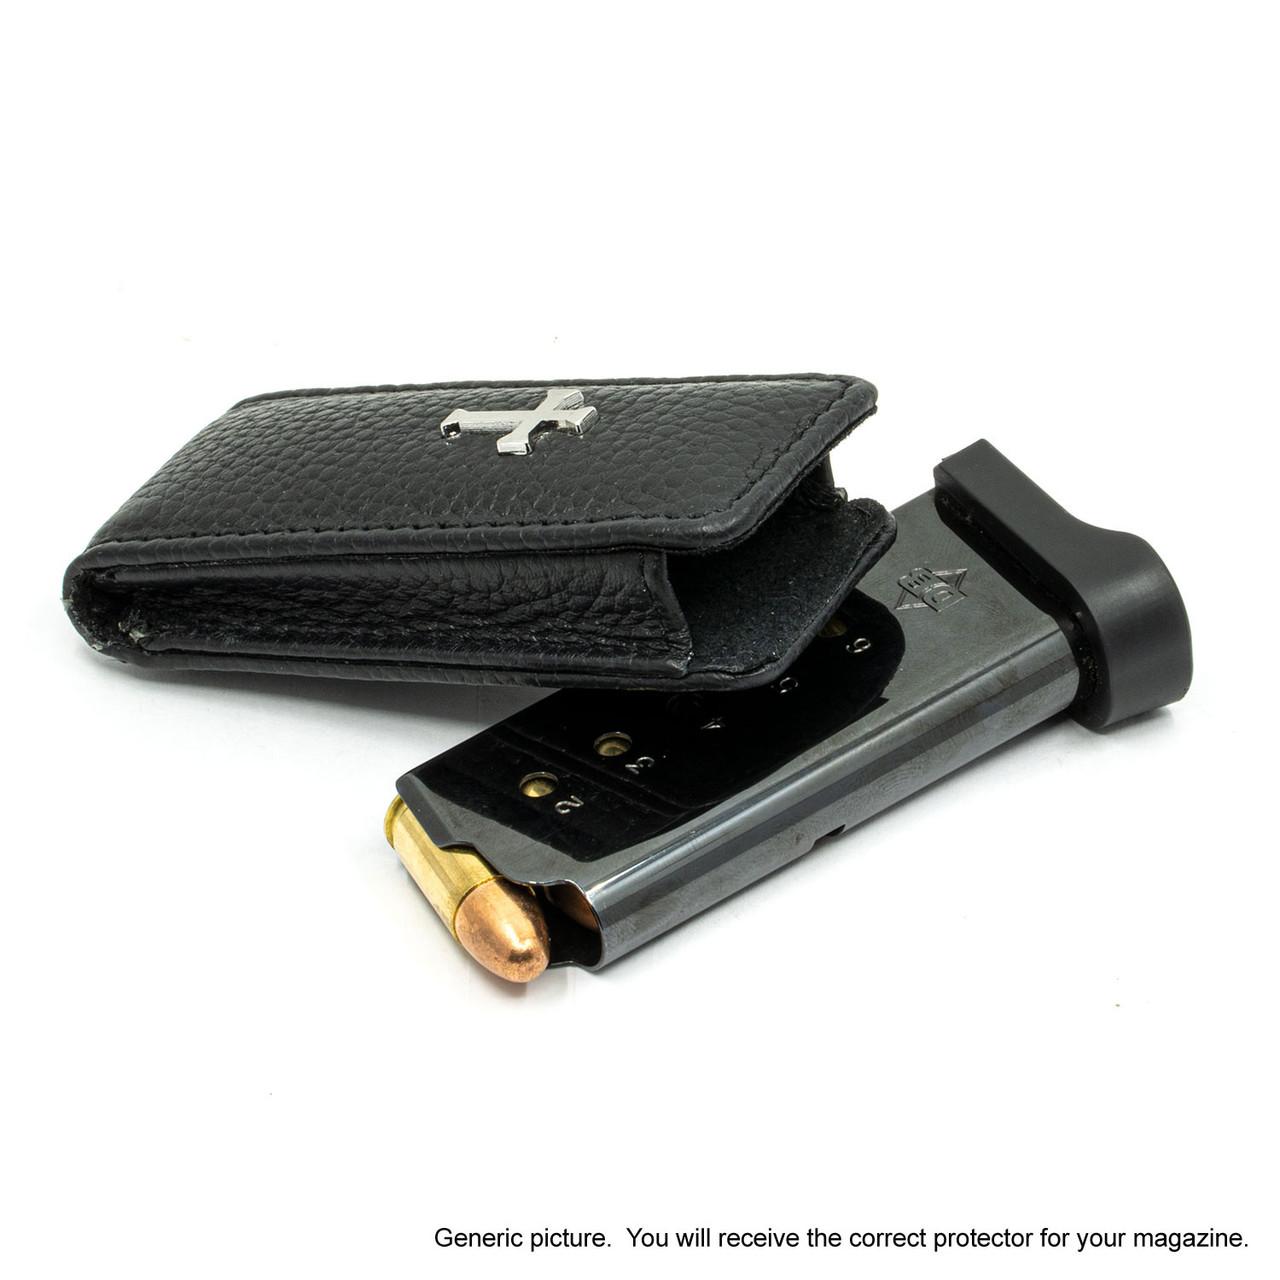 FN 509 Black Leather Cross Magazine Pocket Protector